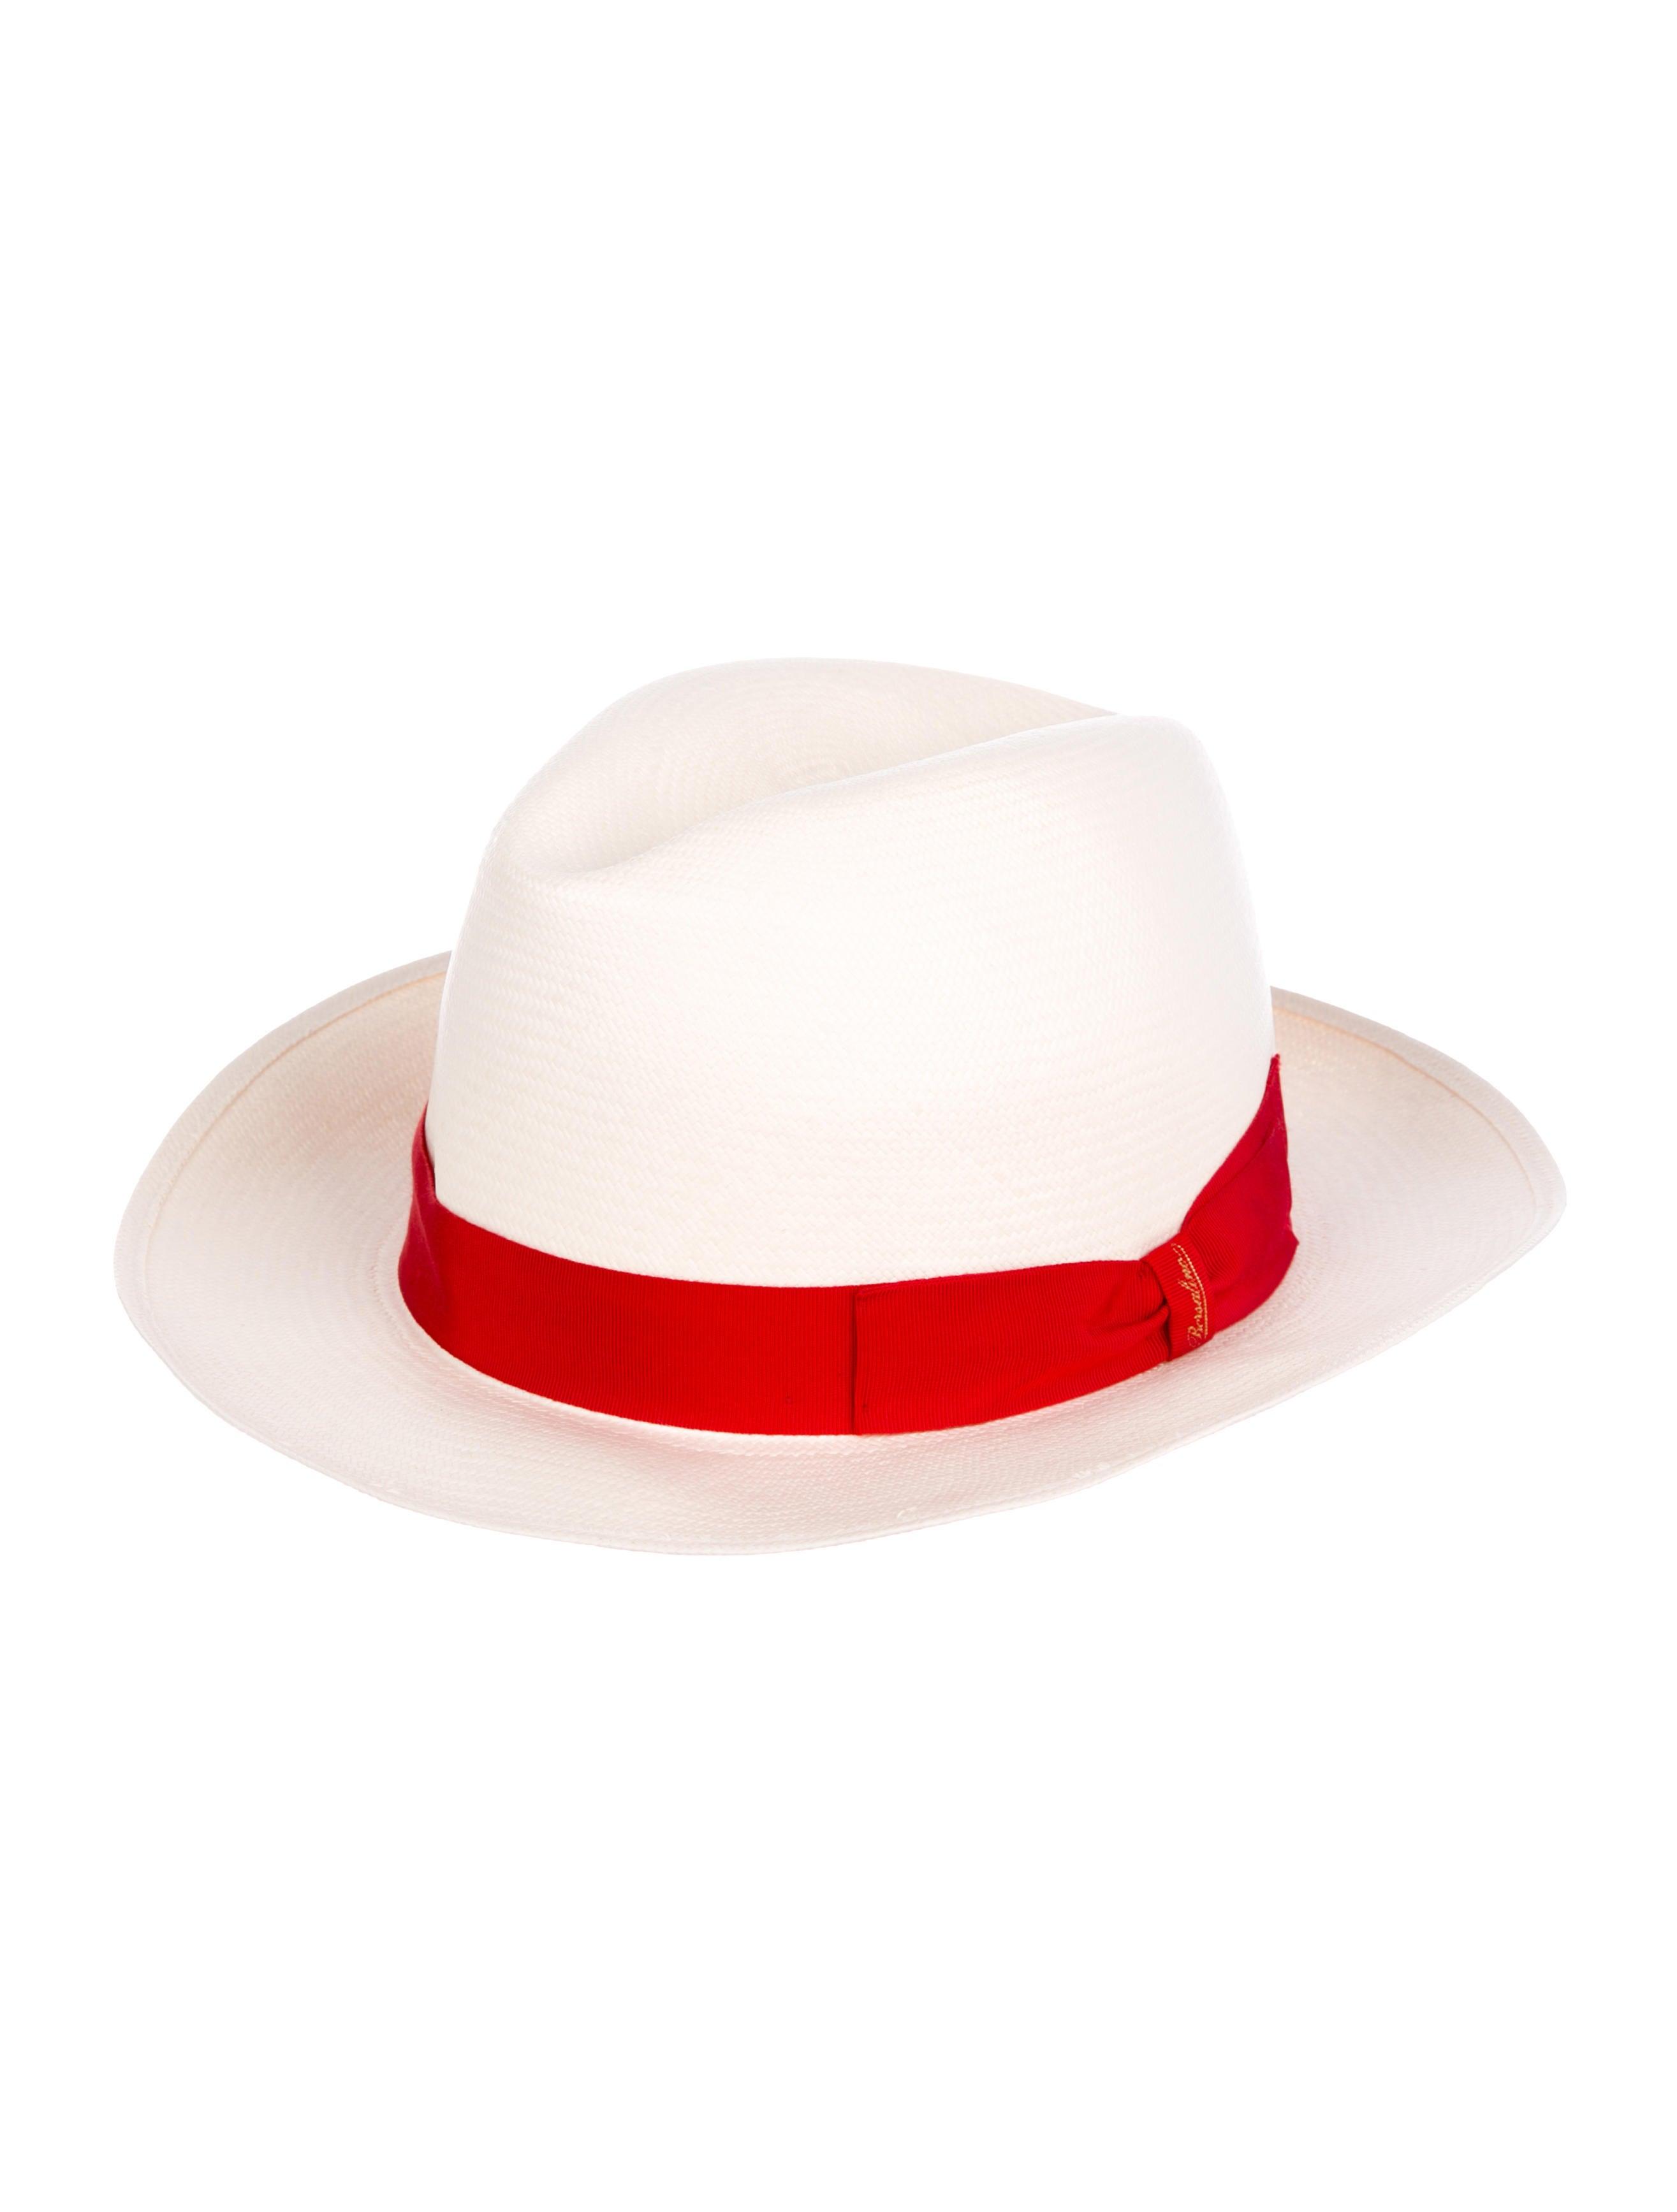 483143ac8ec Borsalino Straw Fedora Hat - Accessories - BSL20191